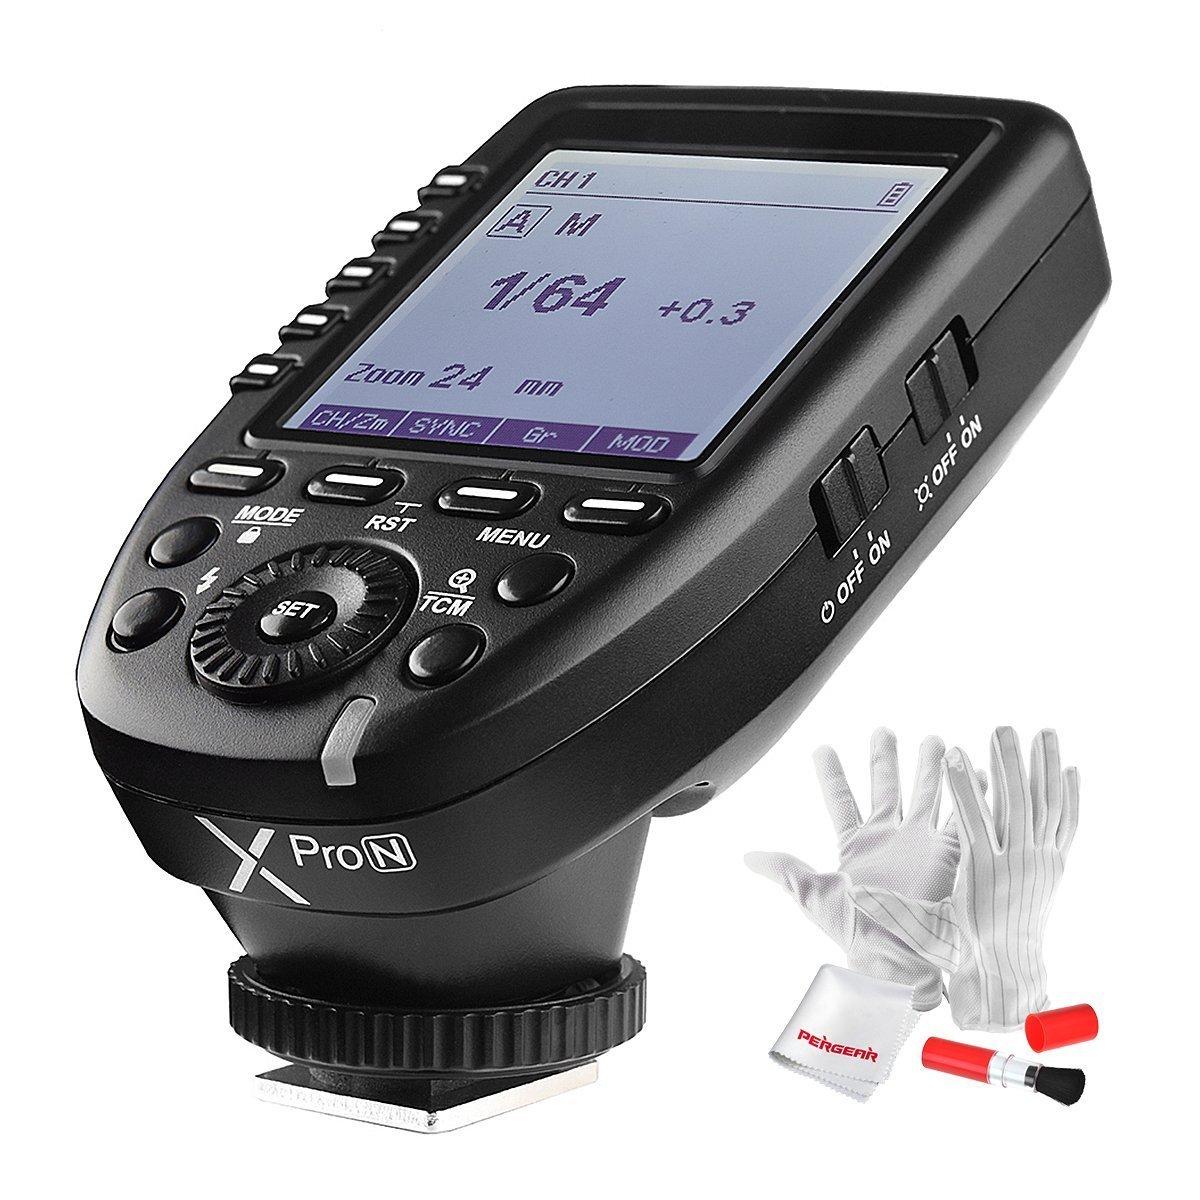 【PDF日本語説明書&正規品】GODOX Xpro-N送信機 TTL2.4Gワイヤレスフラッシュトリガー 高速同期 1 / 8000s Xシステム Nikon一眼レフカメラ対応  技適マーク付き